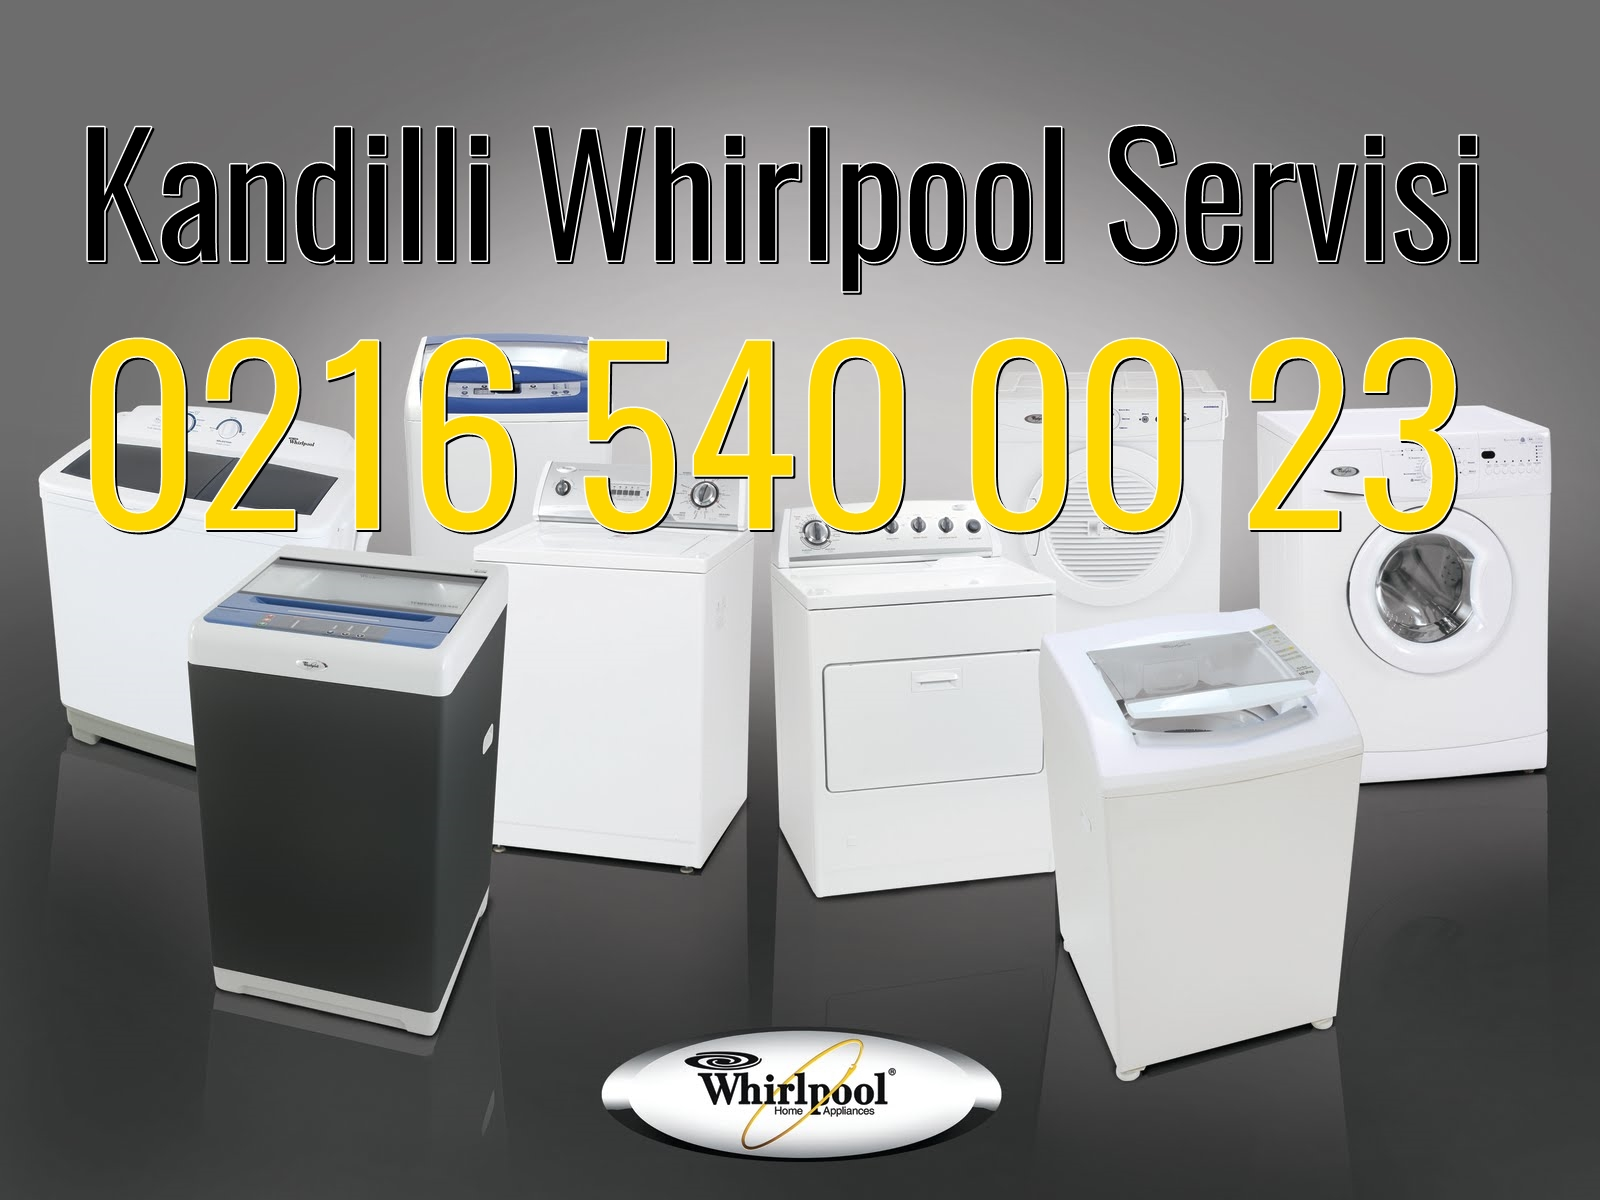 Kandilli Whirlpool Servisi